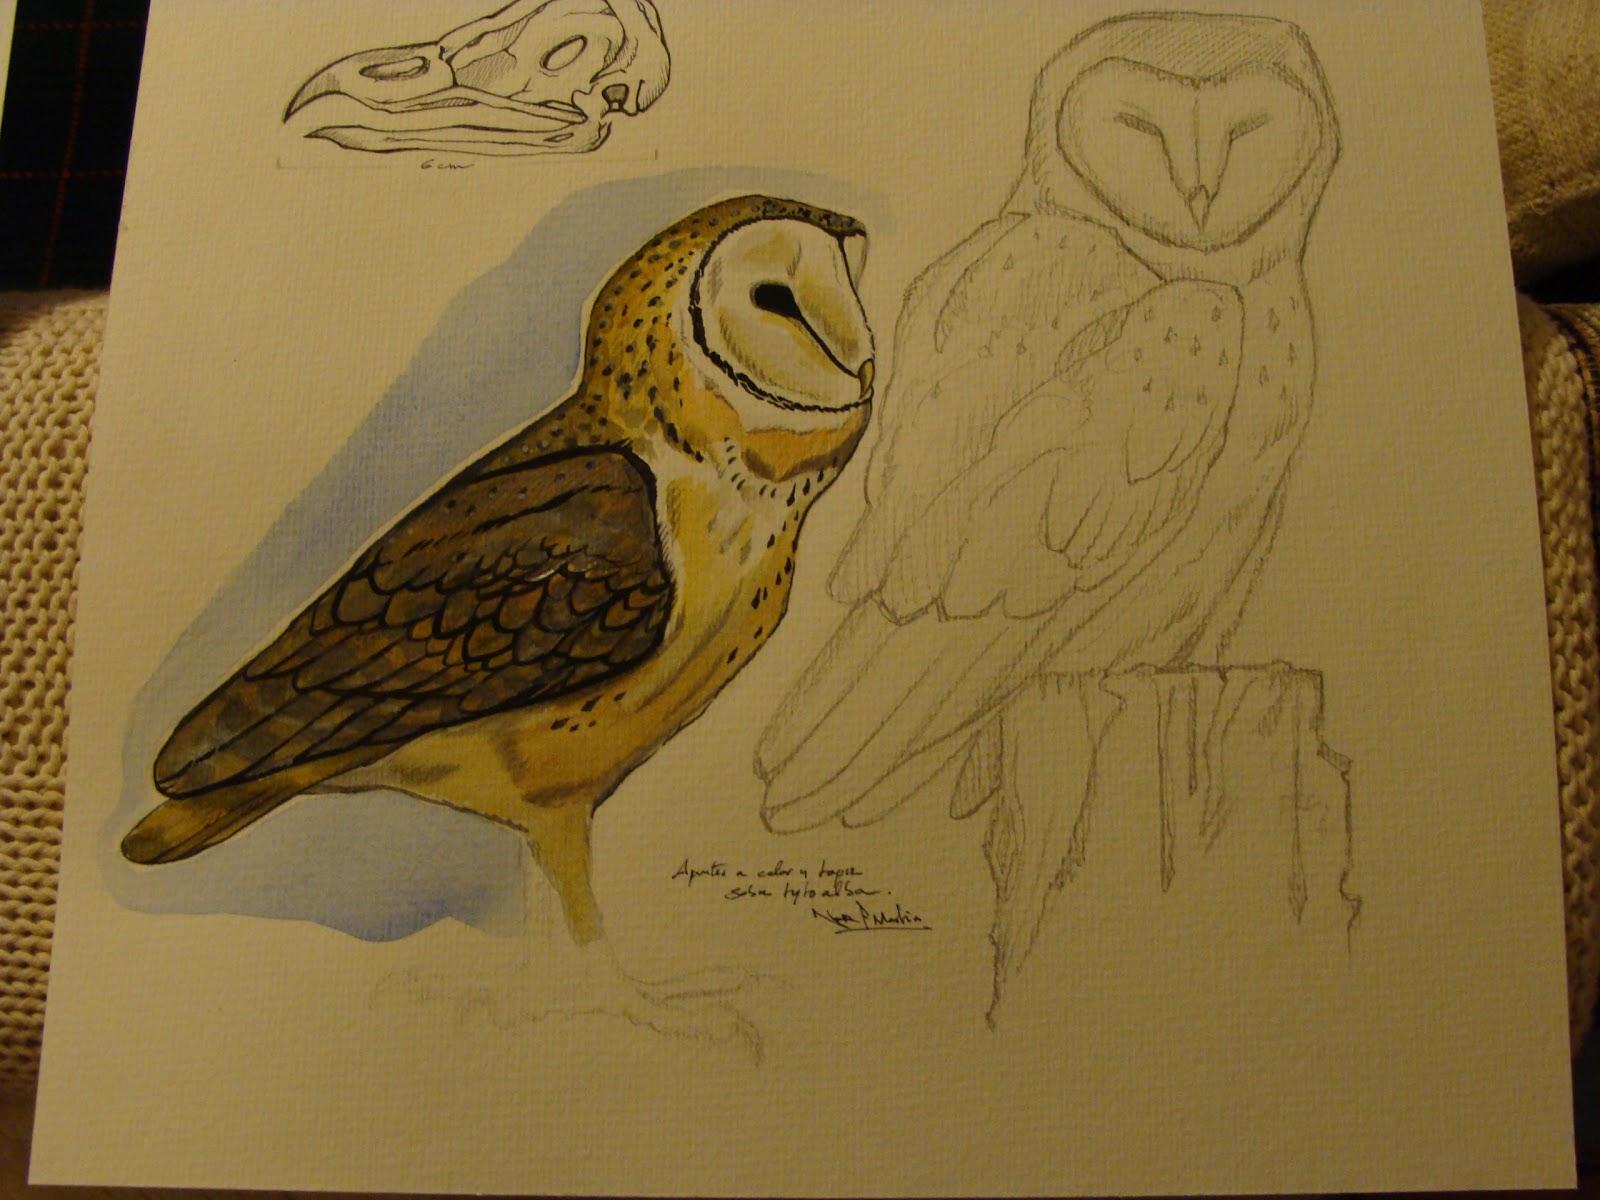 Nor Martin Ilustracion: Lechuzas Comunes (Tyto Alba